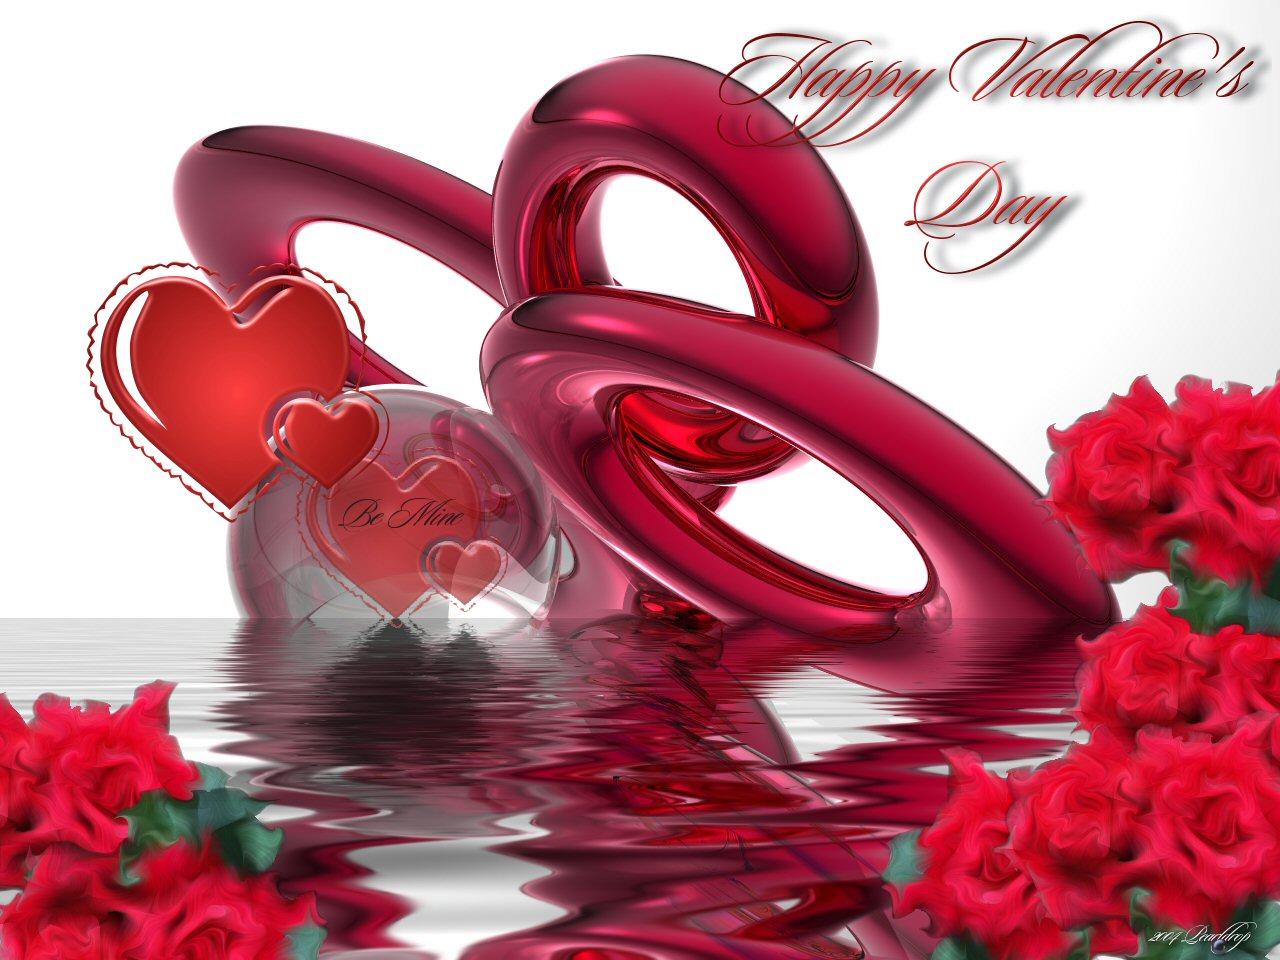 http://1.bp.blogspot.com/-n9Ai_TTd8Uo/TyLJGJVhXaI/AAAAAAAADPE/9i0ZIfgI-uw/s1600/valentine-wallpaper-download-3d.JPG